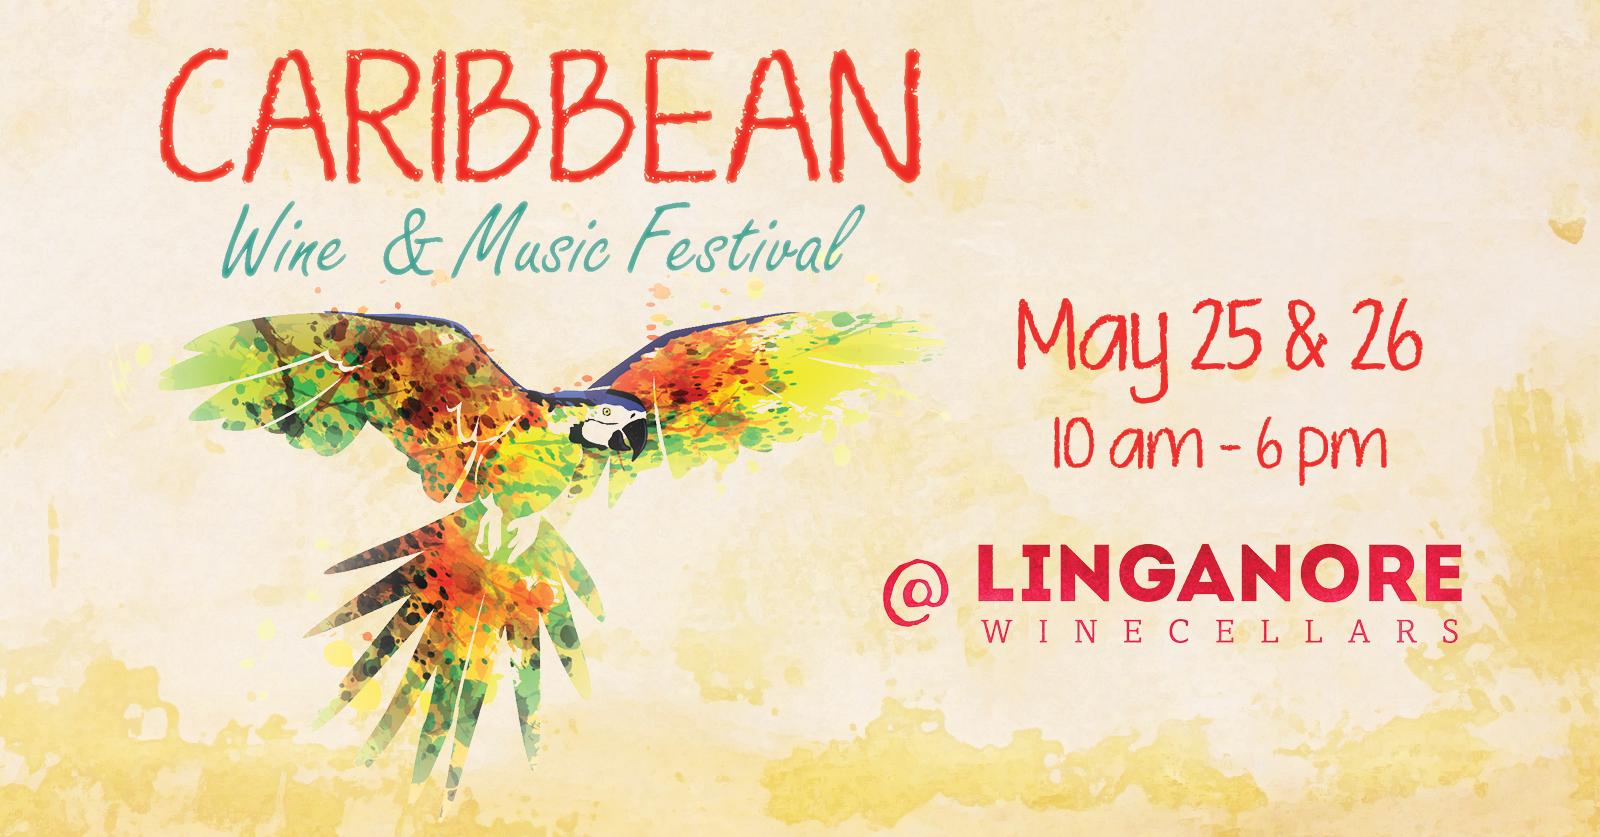 Caribbean Wine & Music Festival